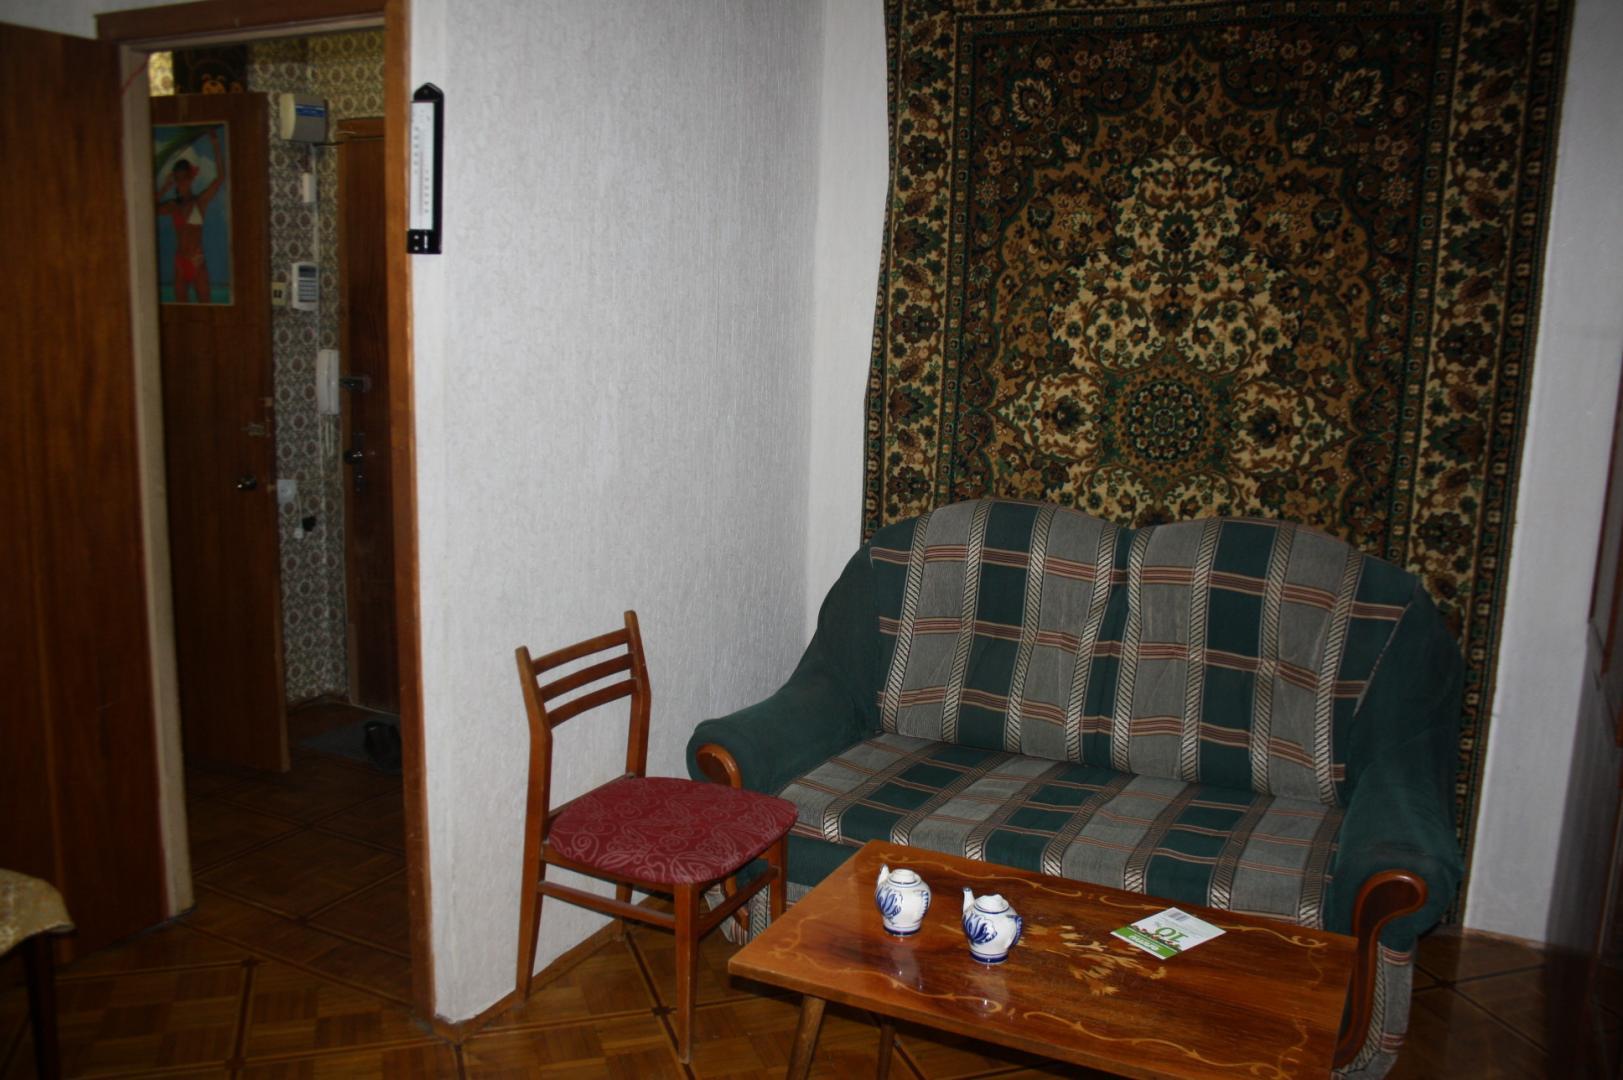 Квартира, 1 комната, 35 м² в Люберцах 89160792833 купить 3